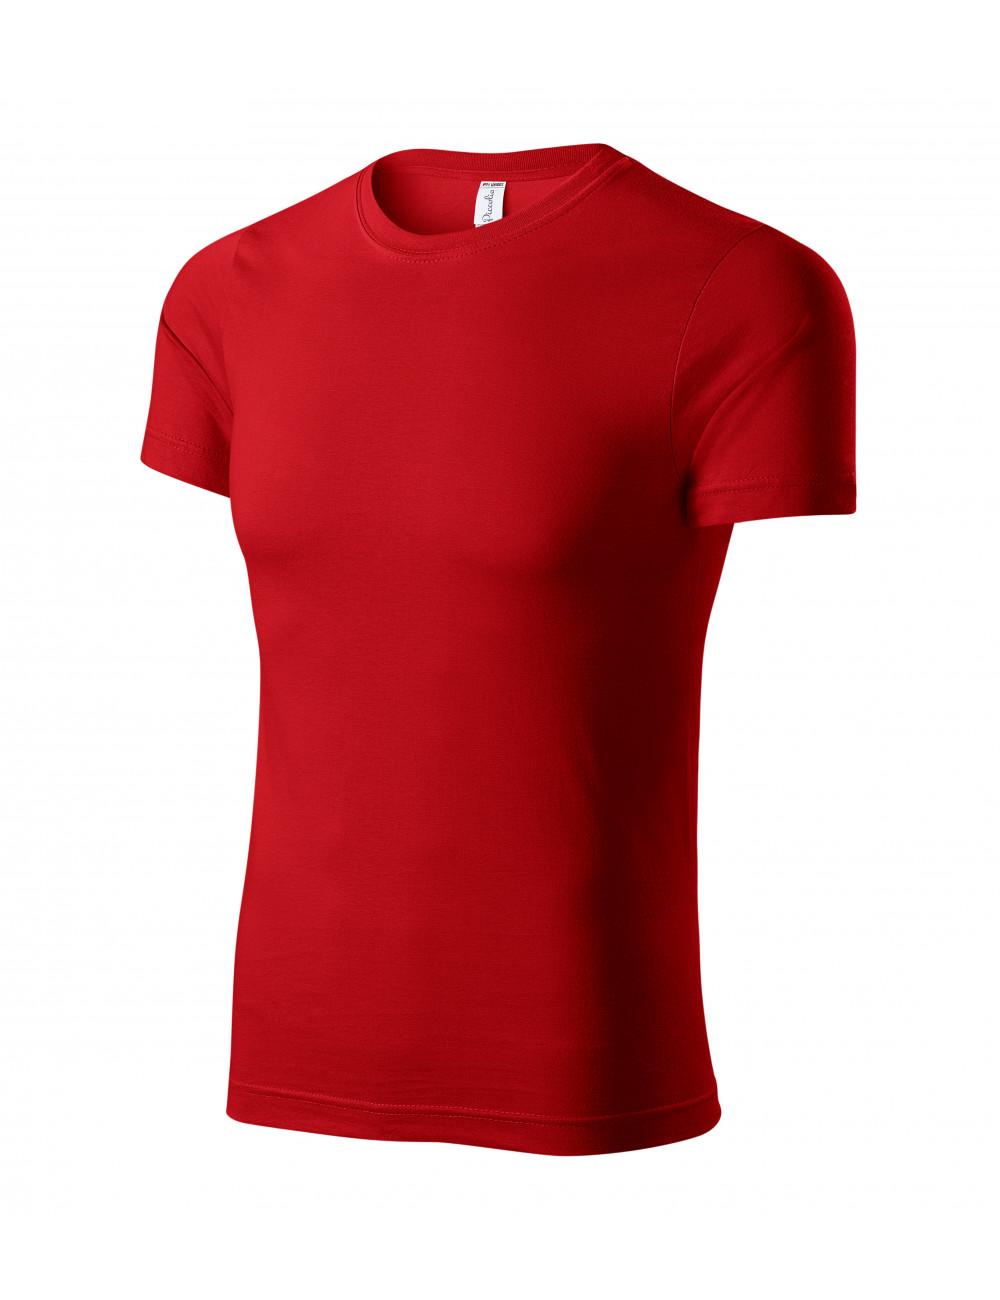 Adler PICCOLIO Koszulka unisex Parade P71 czerwony